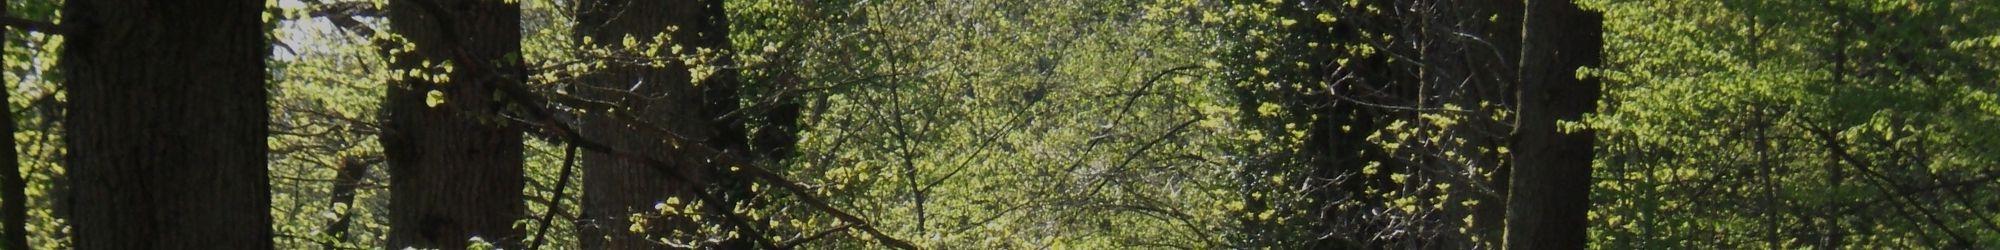 Forêt près de Loudéac